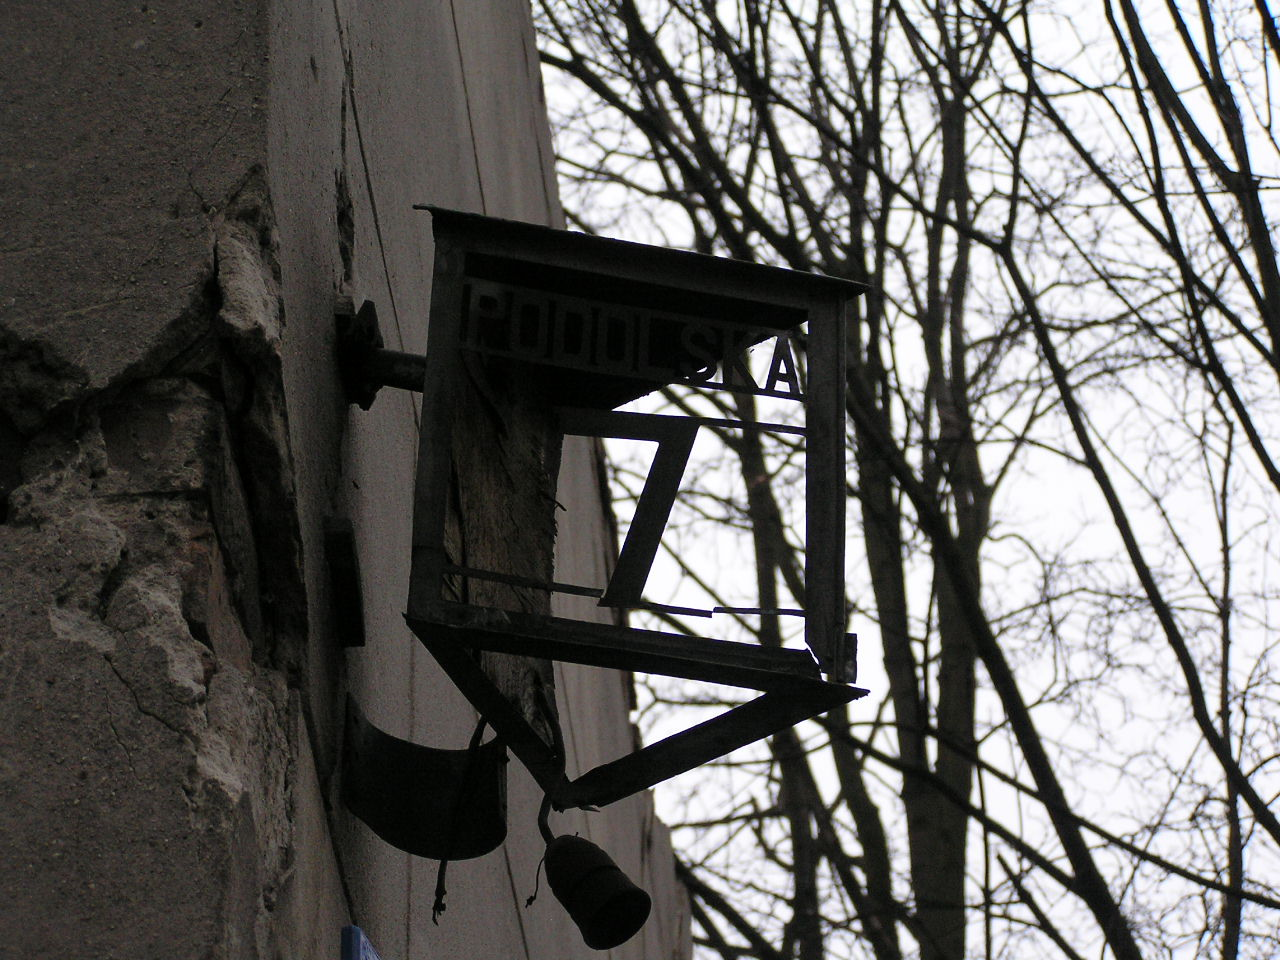 Latarenka adresowa - Podolska 7